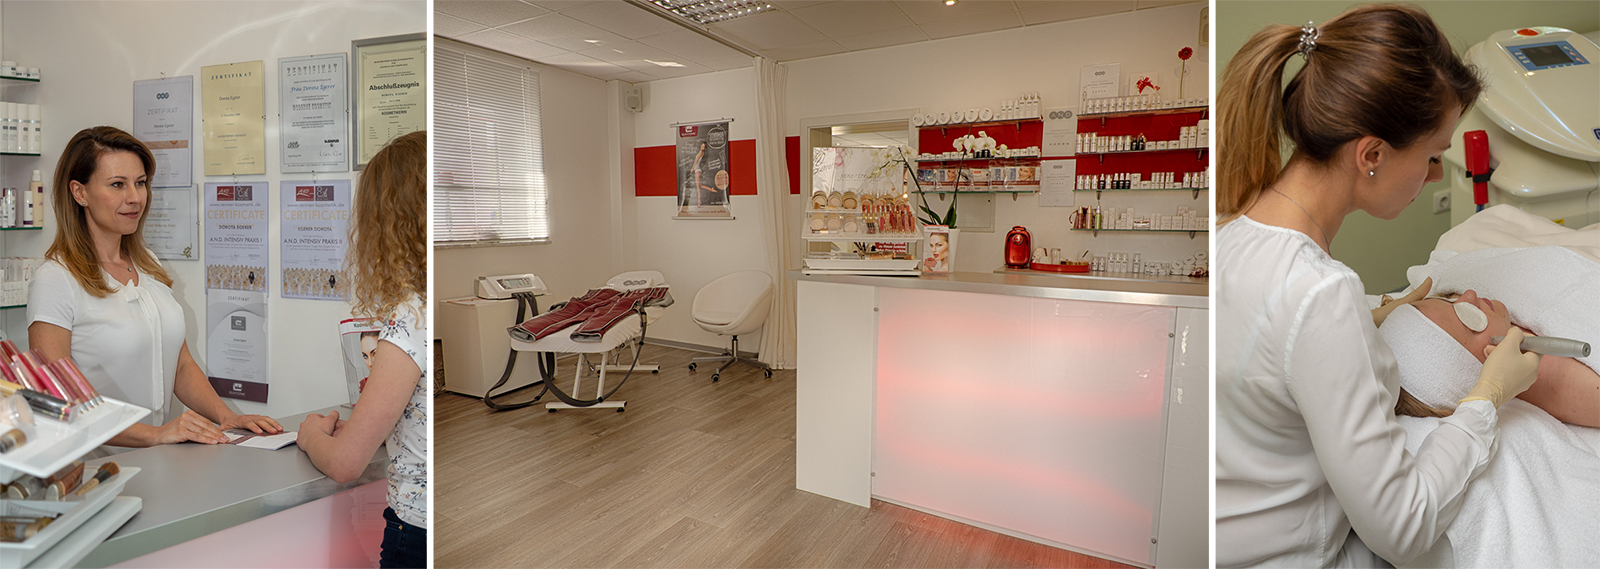 Studio & Behandlung | Kosmetikstudio Egerer